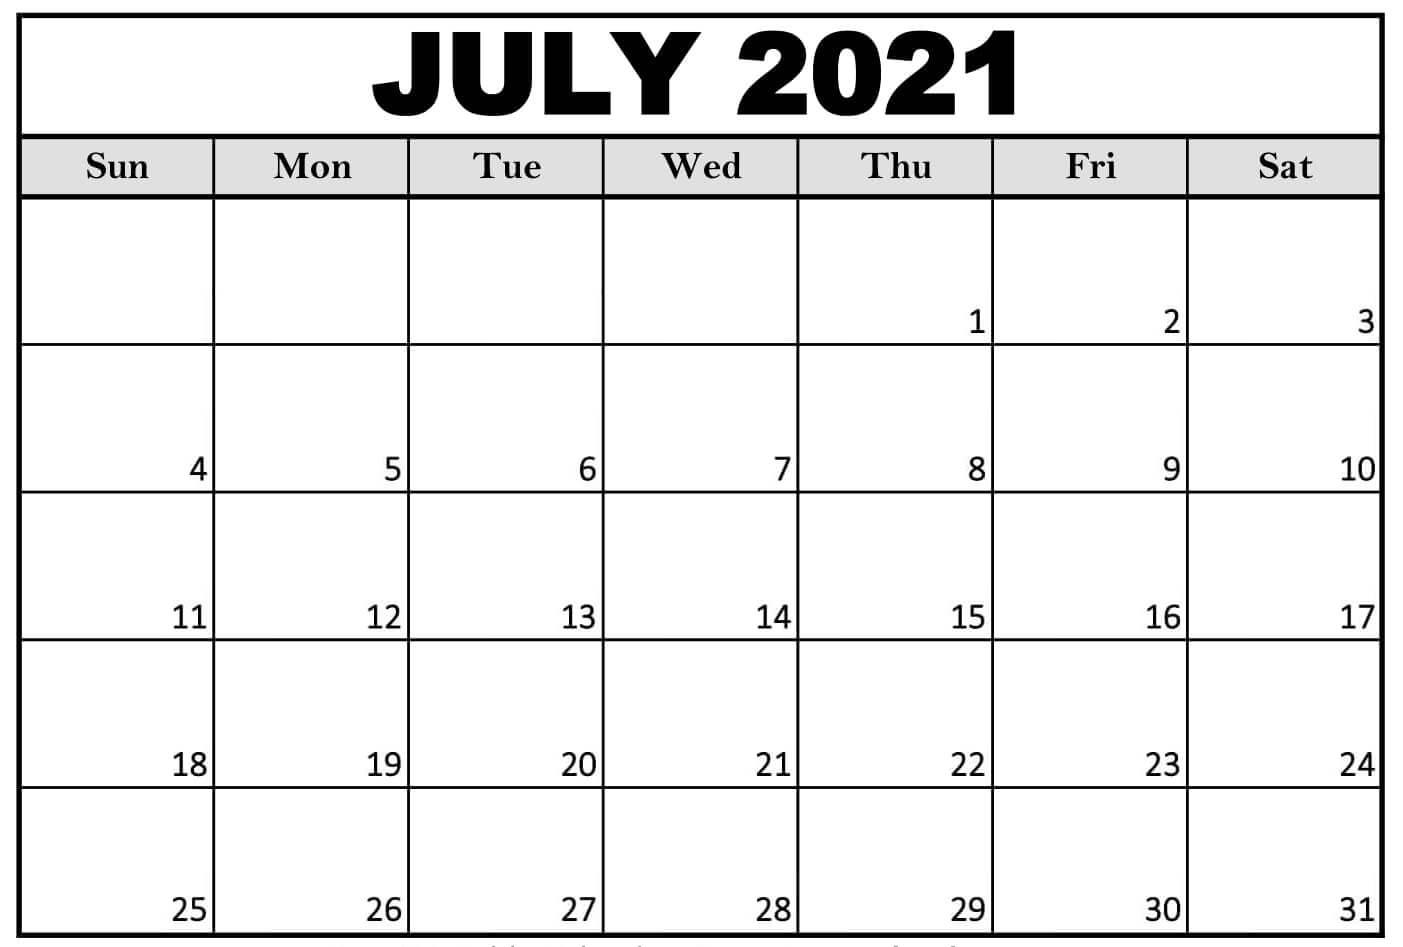 July 2021 Calendar Template Blank